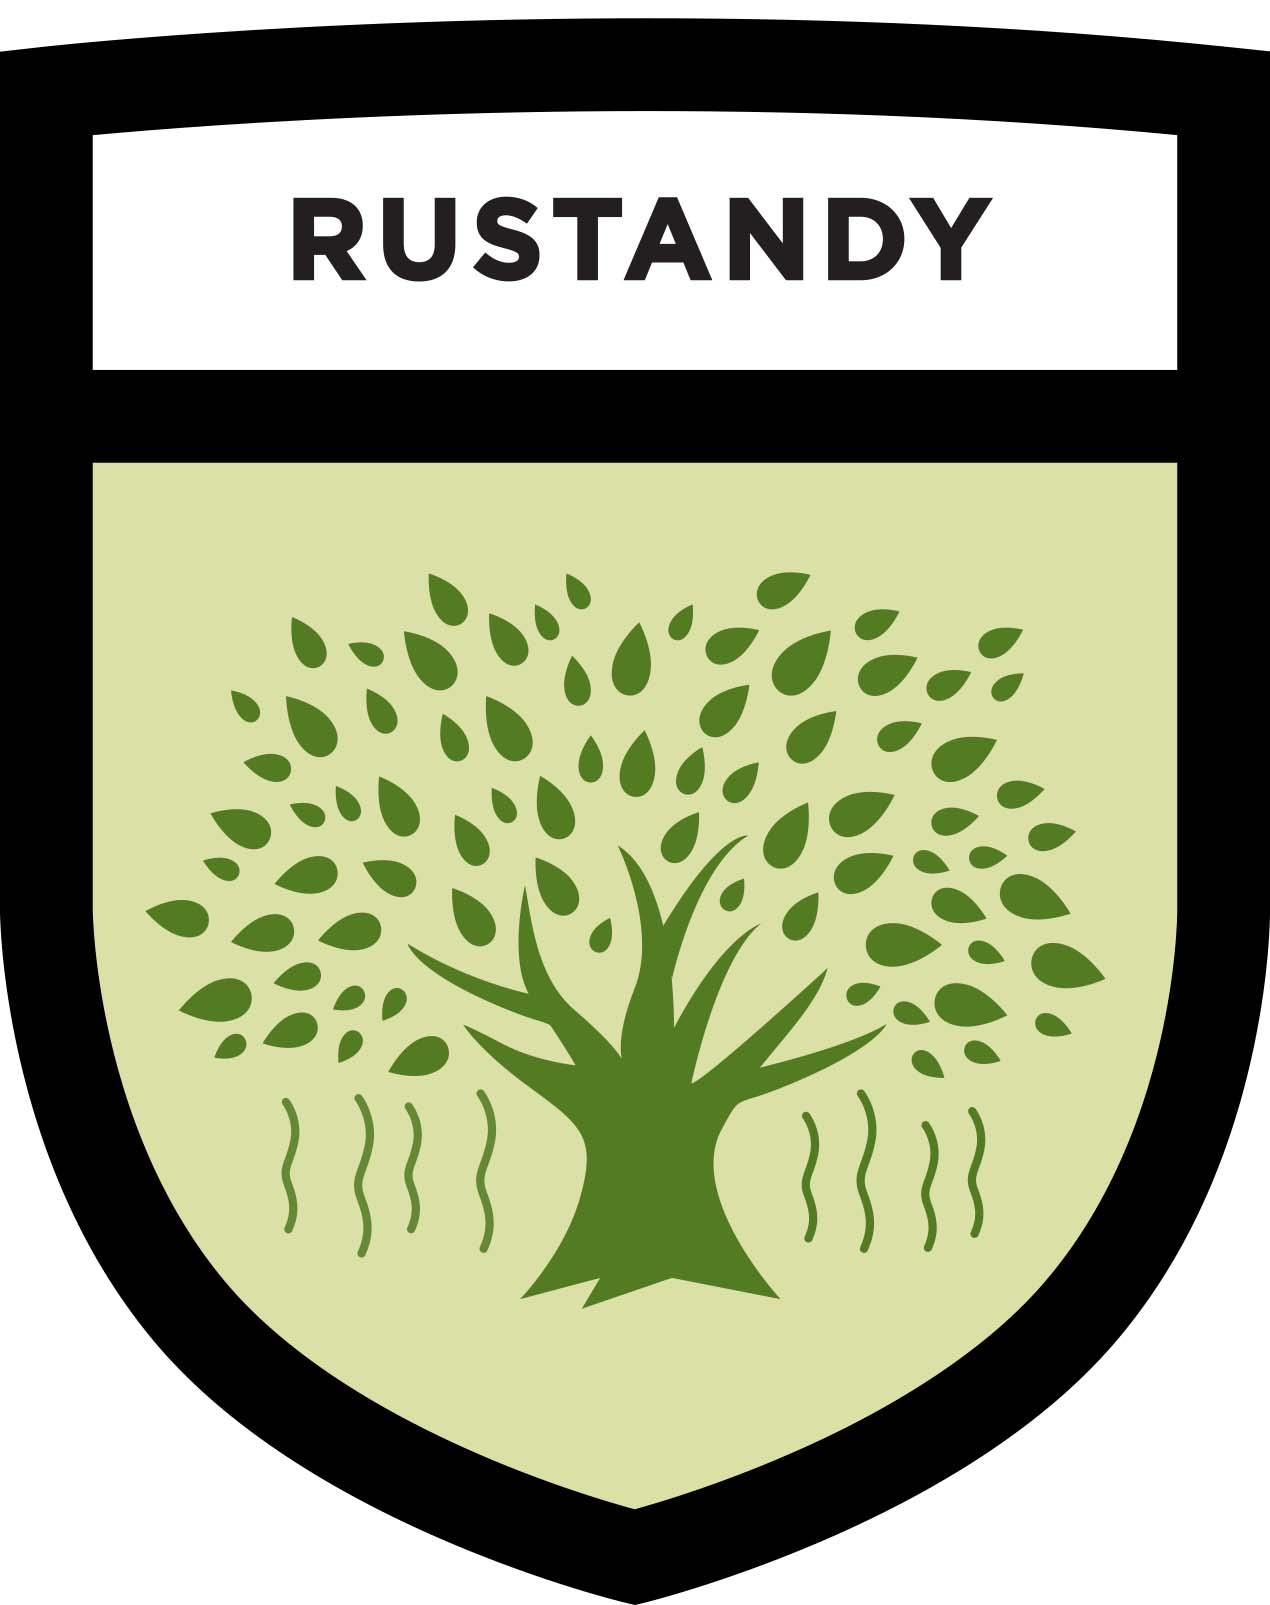 Rustandy Shield